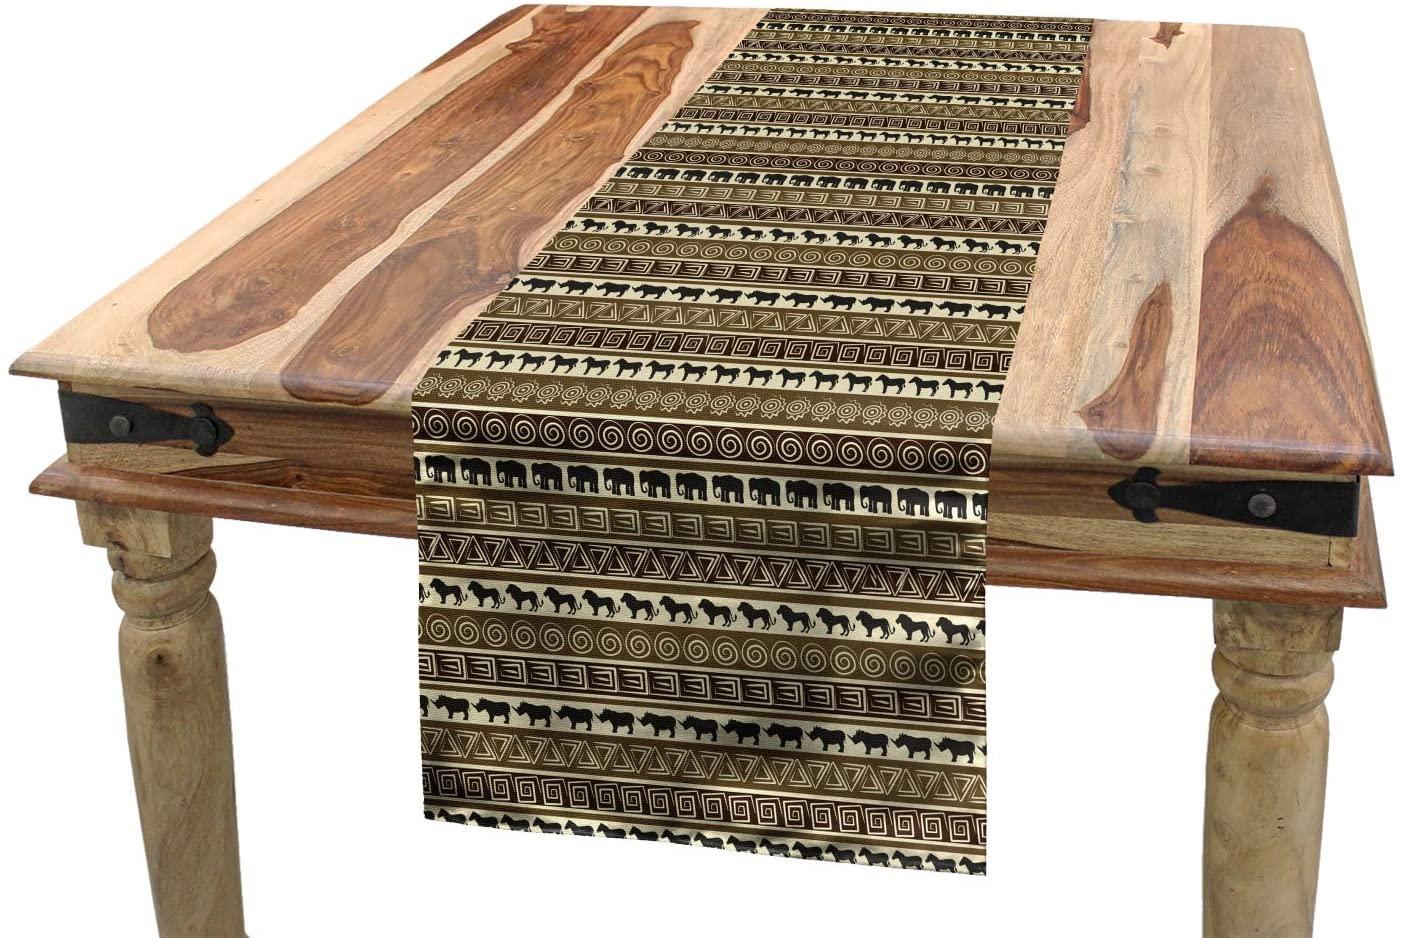 Ambesonne Safari Table Runner, Style Geometrical Pattern with Wild Animals in Horizontal Line Art, Dining Room Kitchen Rectangular Runner, 16